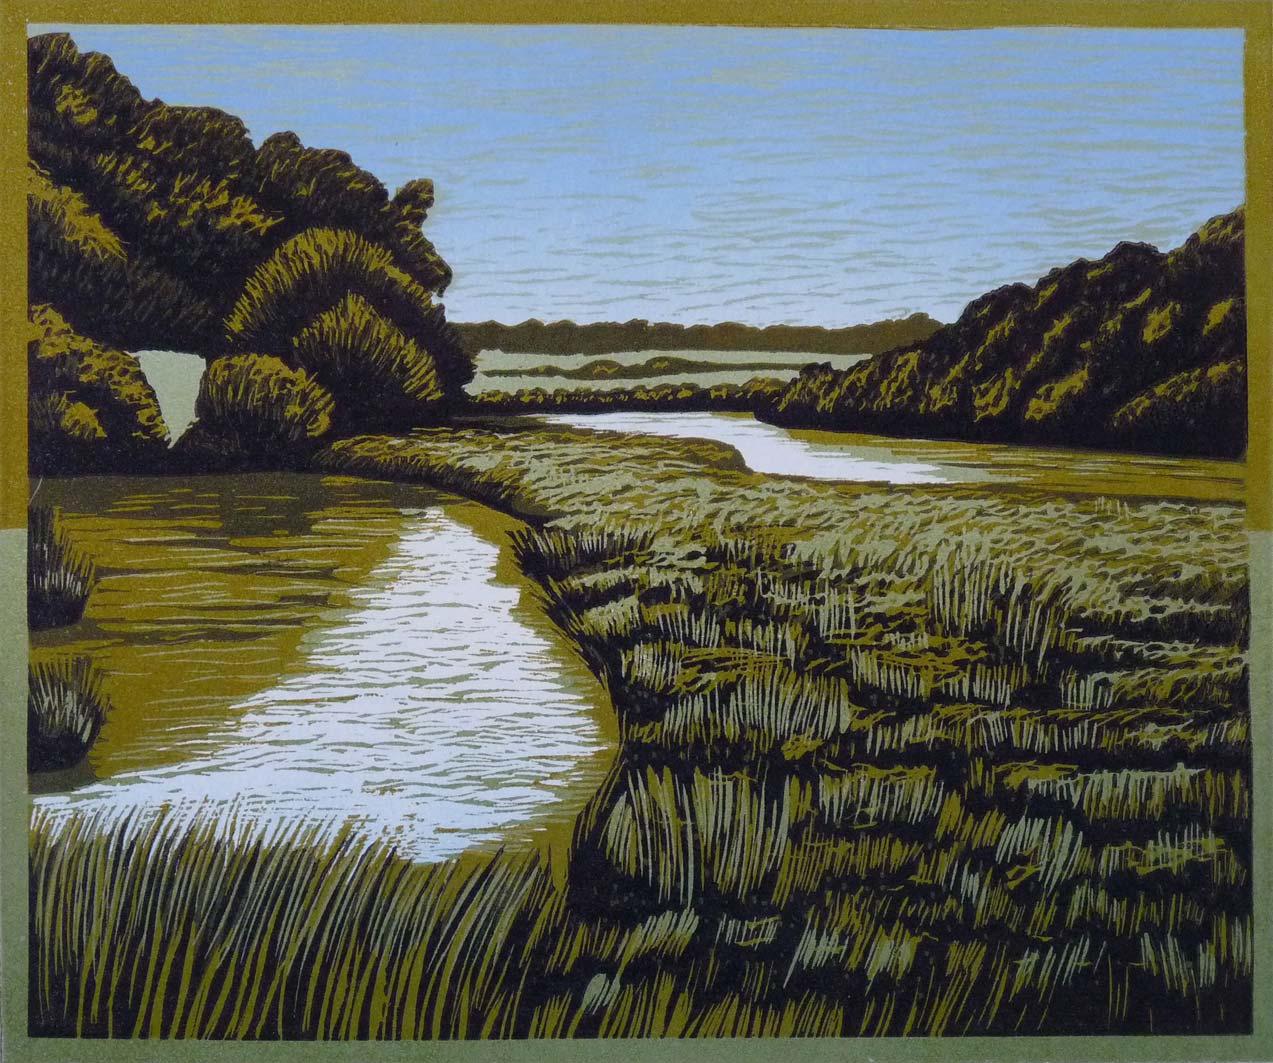 River at Dusk, 20x24, ed: 22, no longer available